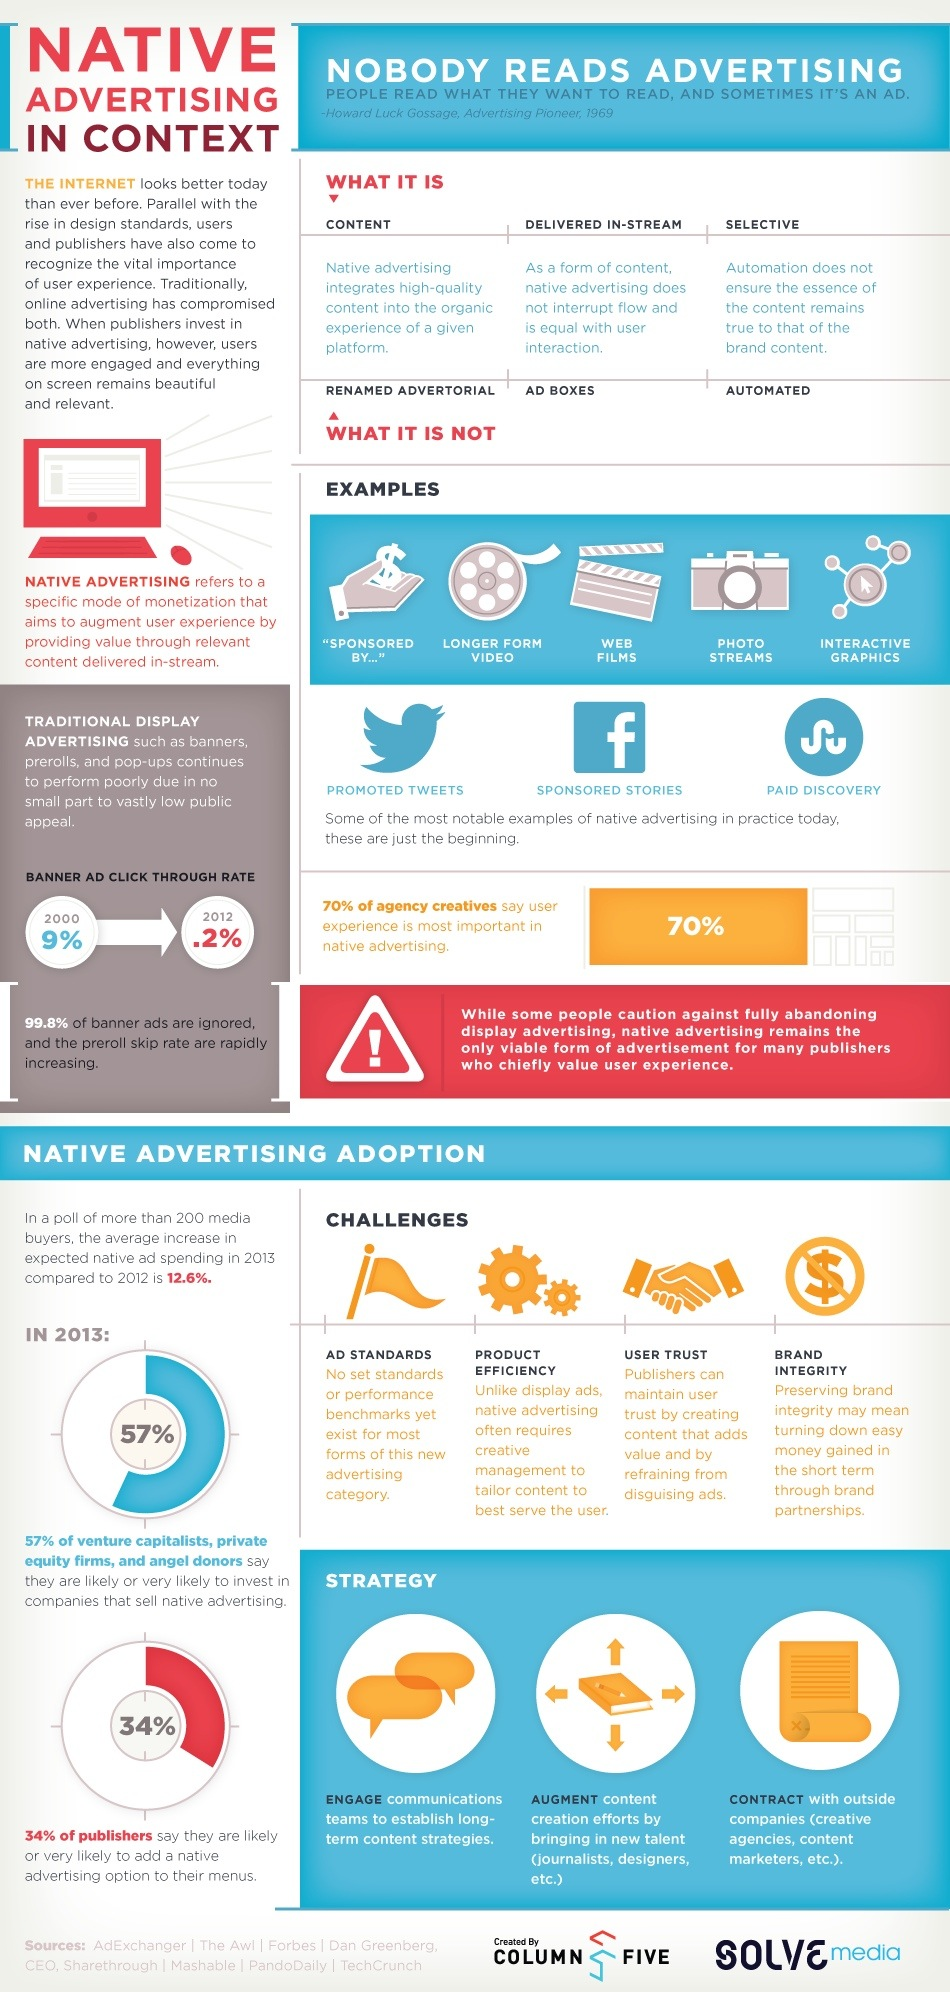 solve media native display advertising Infographic 2013